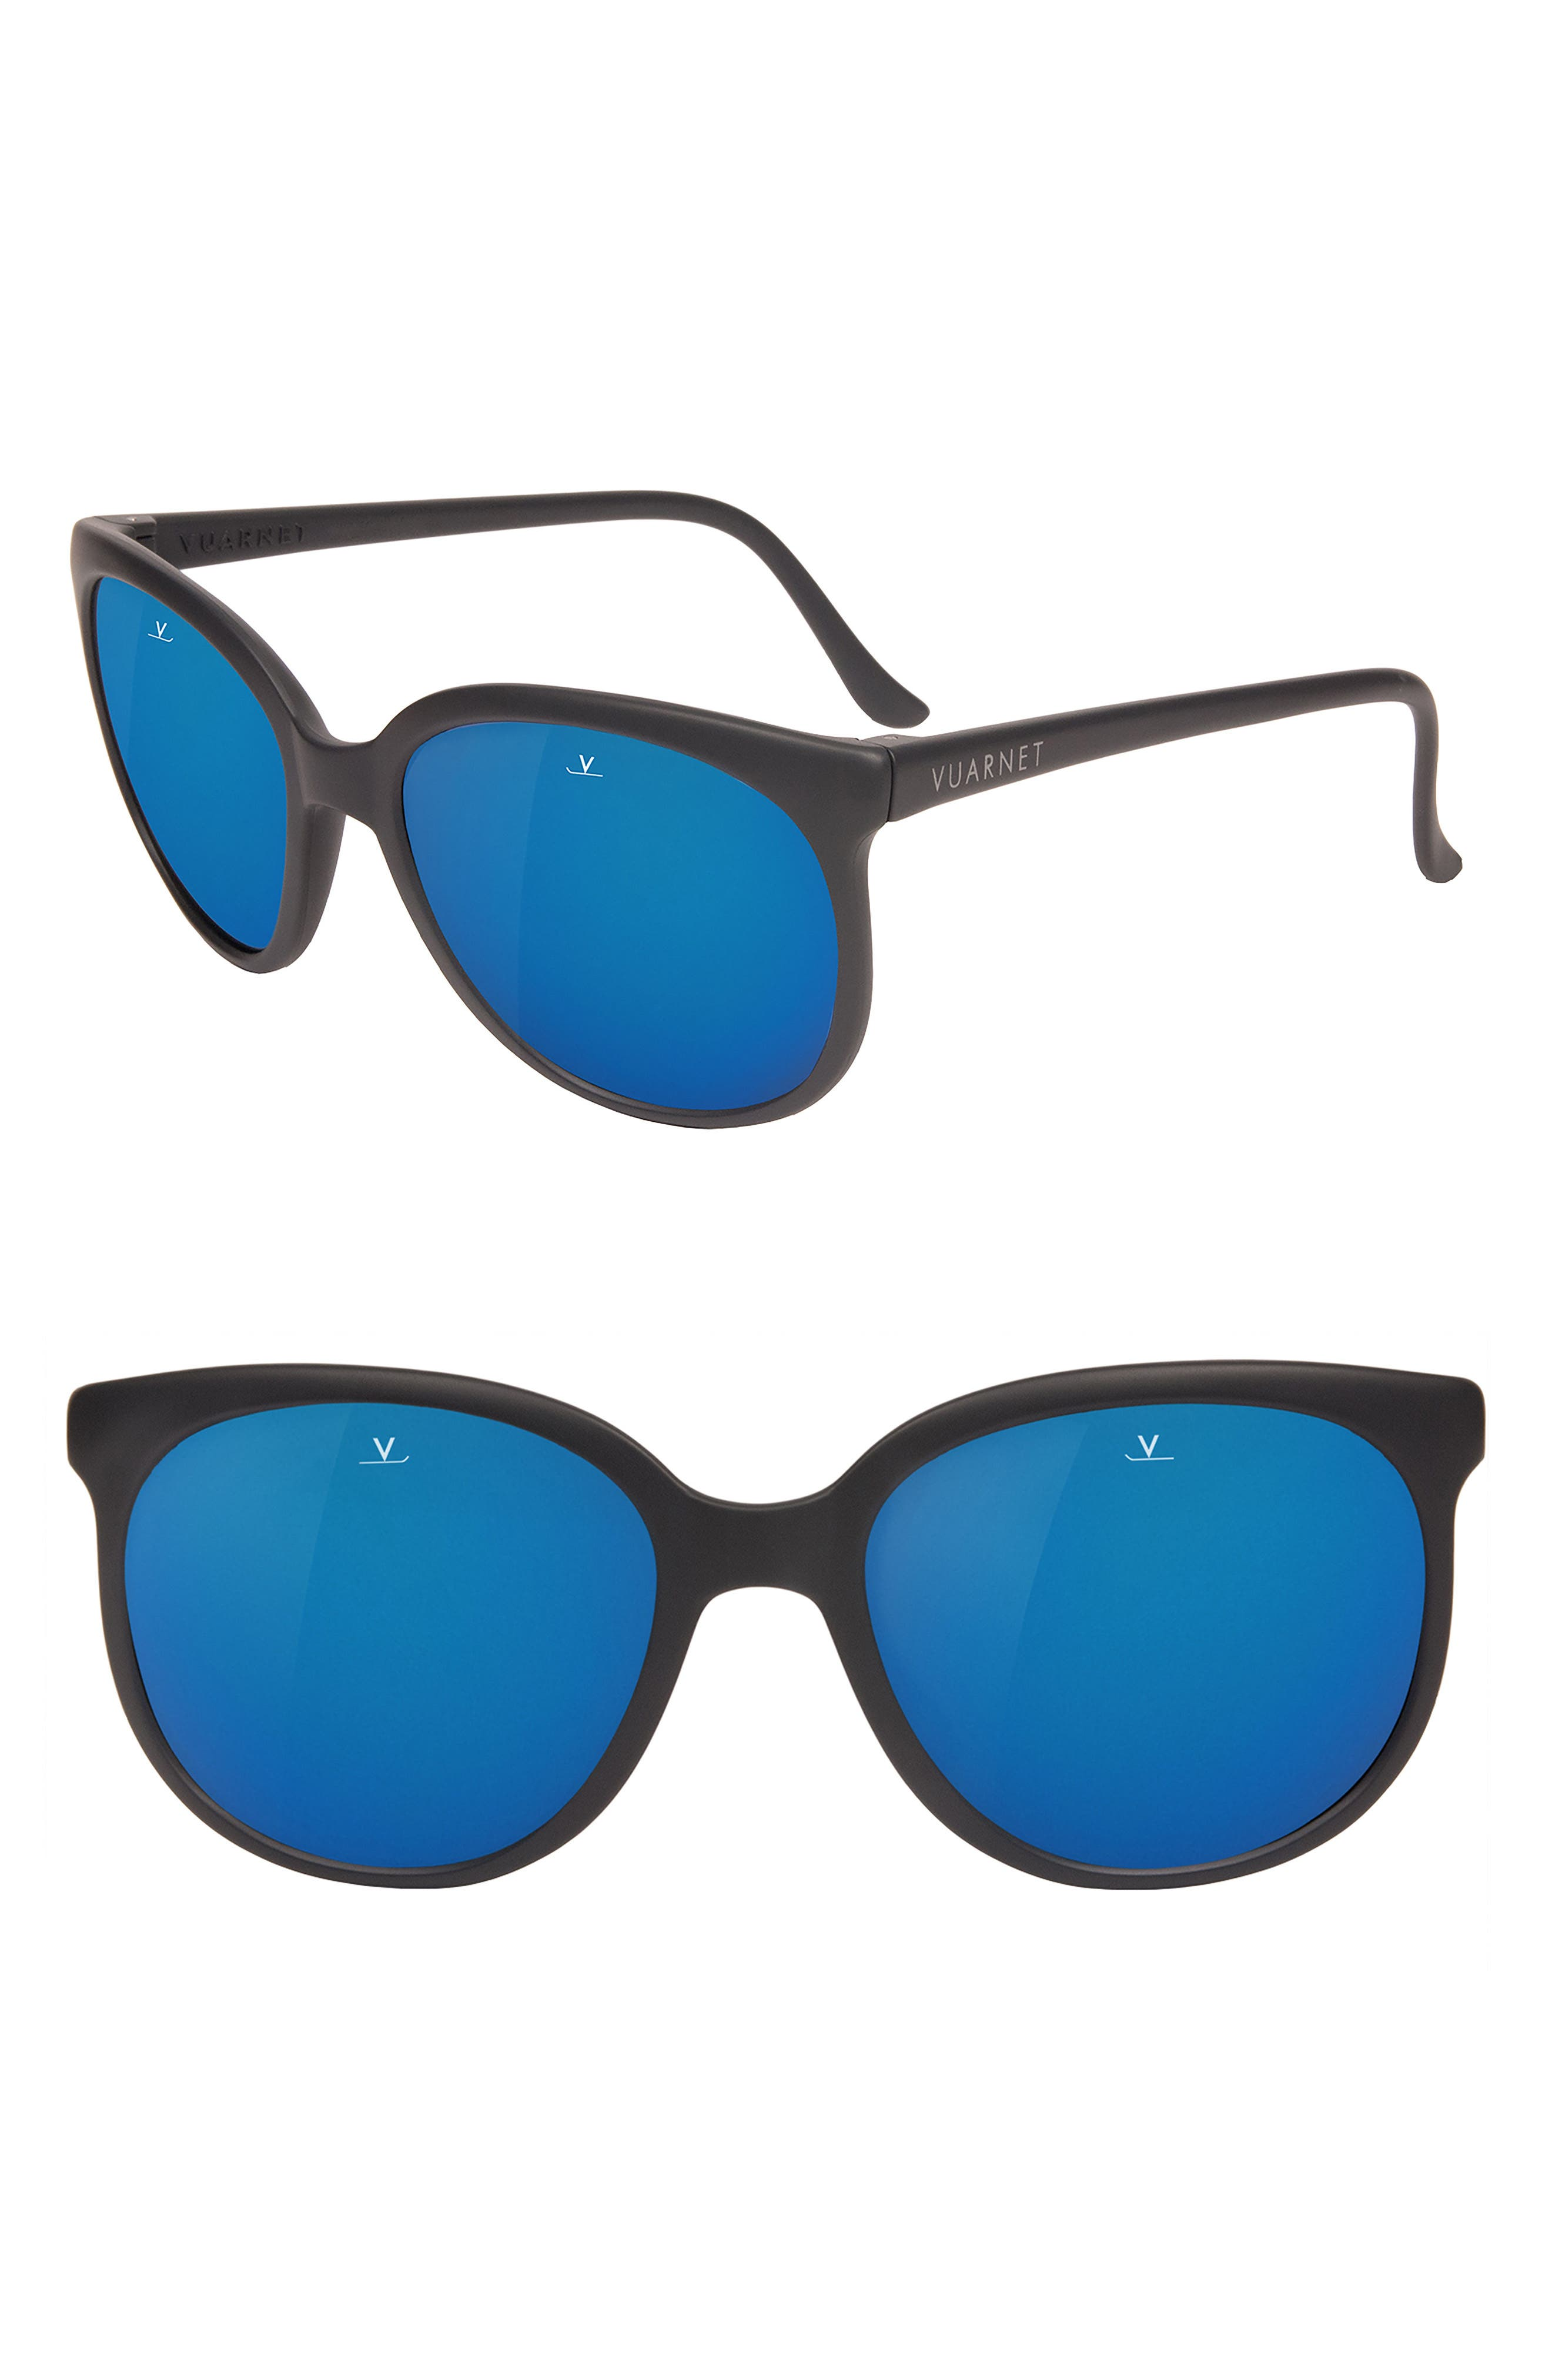 Legends 02 55mm Polarized Sunglasses,                         Main,                         color, Grey Polar Blue Flash